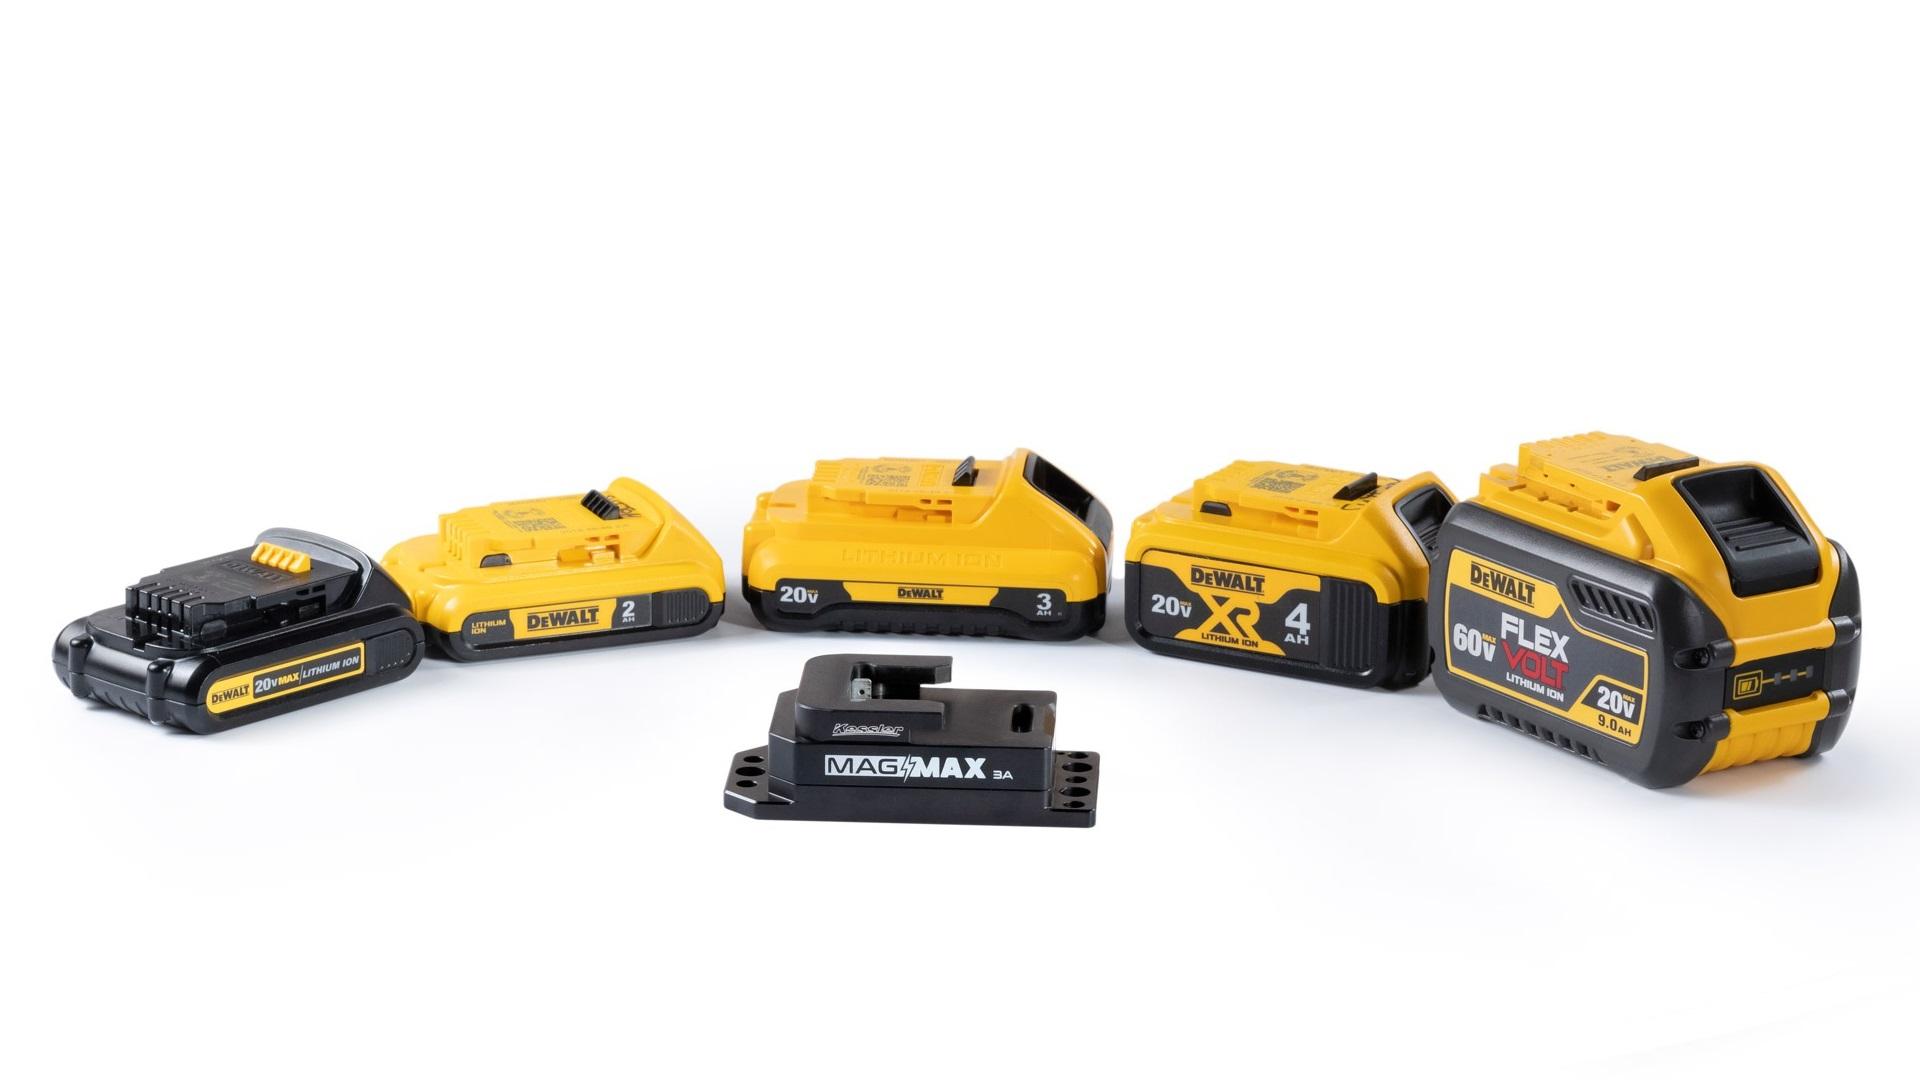 Adaptador Kessler Mag Max 3A - usa baterías asequibles DeWalt para tu equipo de cámara